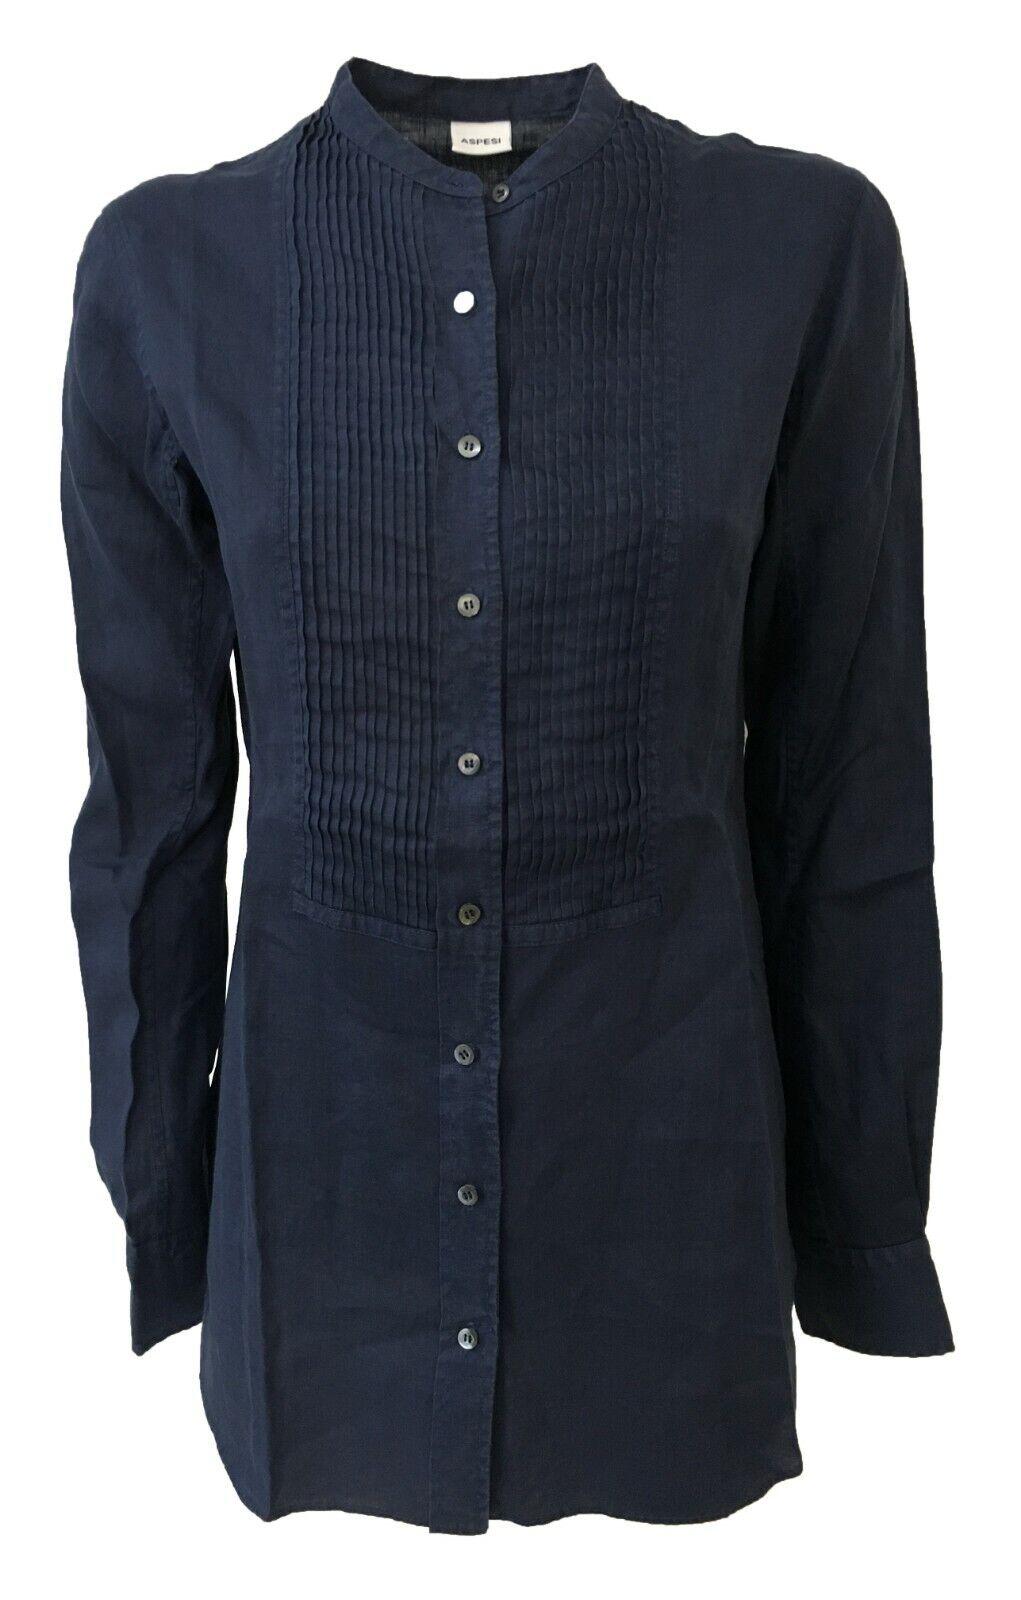 Damenhemd Blau Aspesi Modell H H713 C195 in 100% Leinen